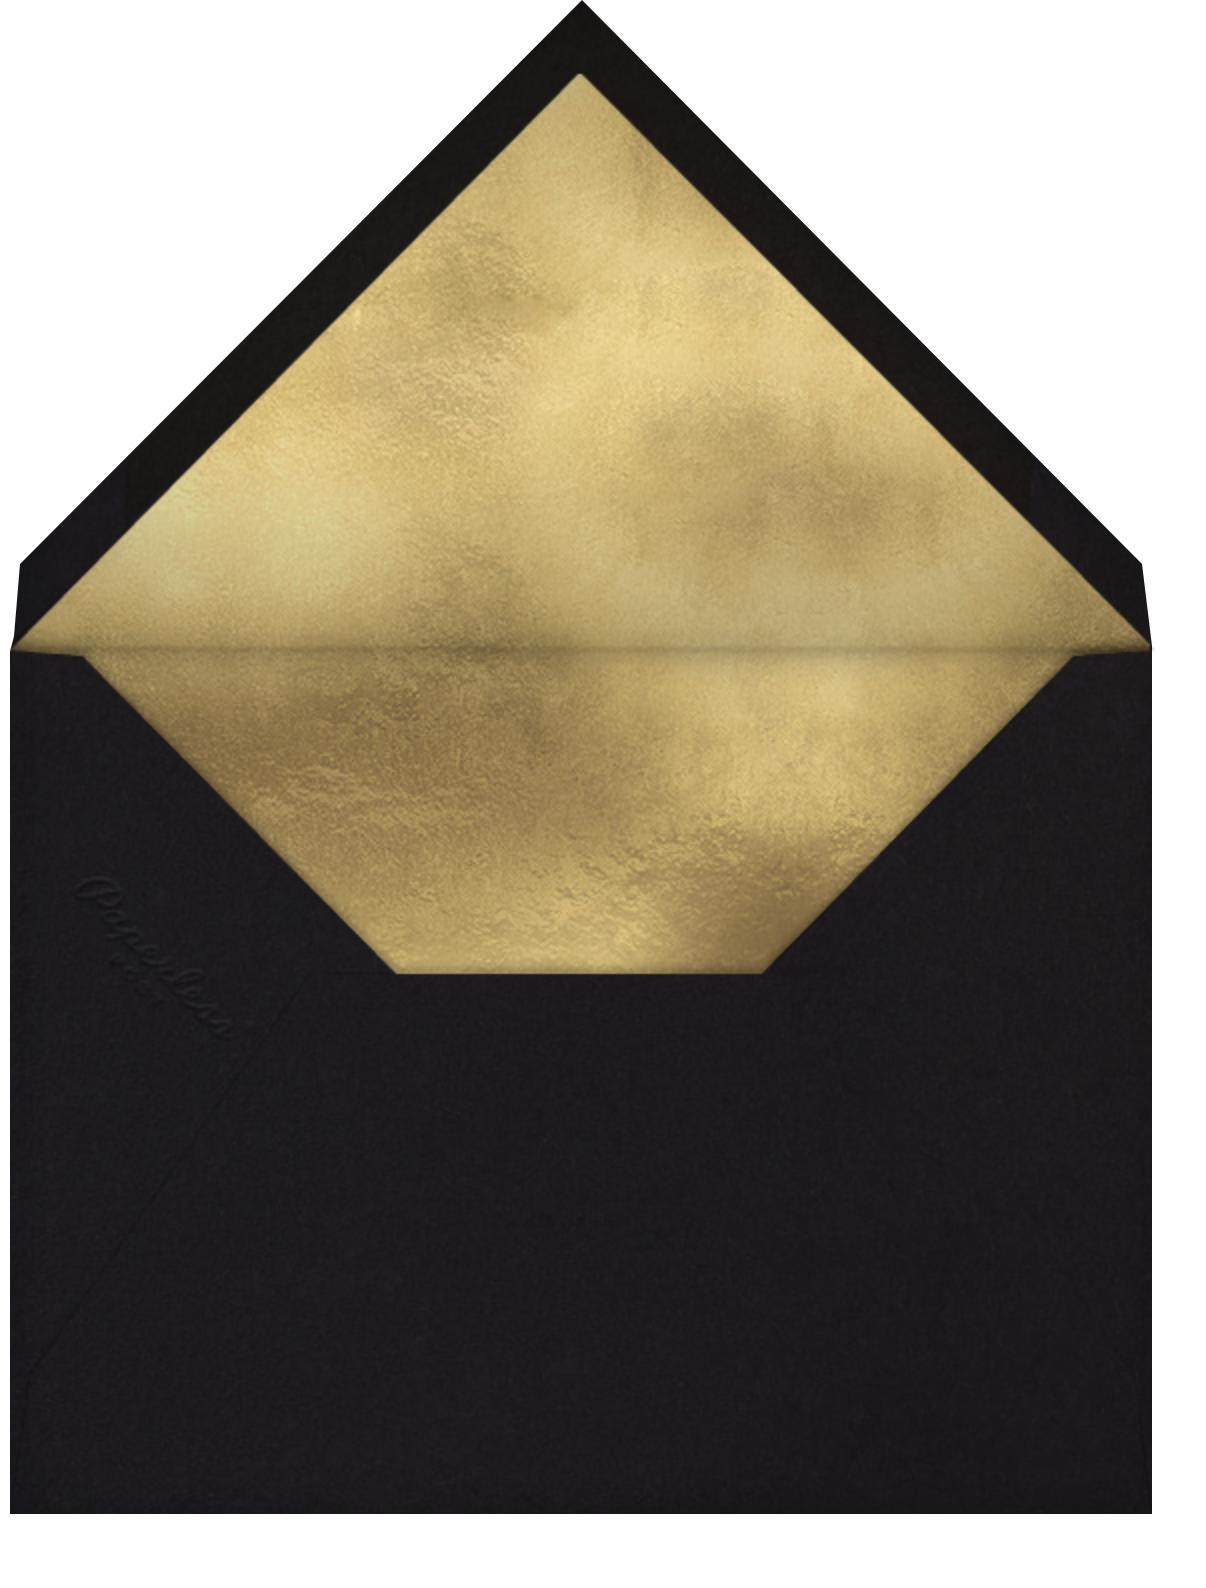 Better Halves - Black/Gold - kate spade new york - Anniversary party - envelope back